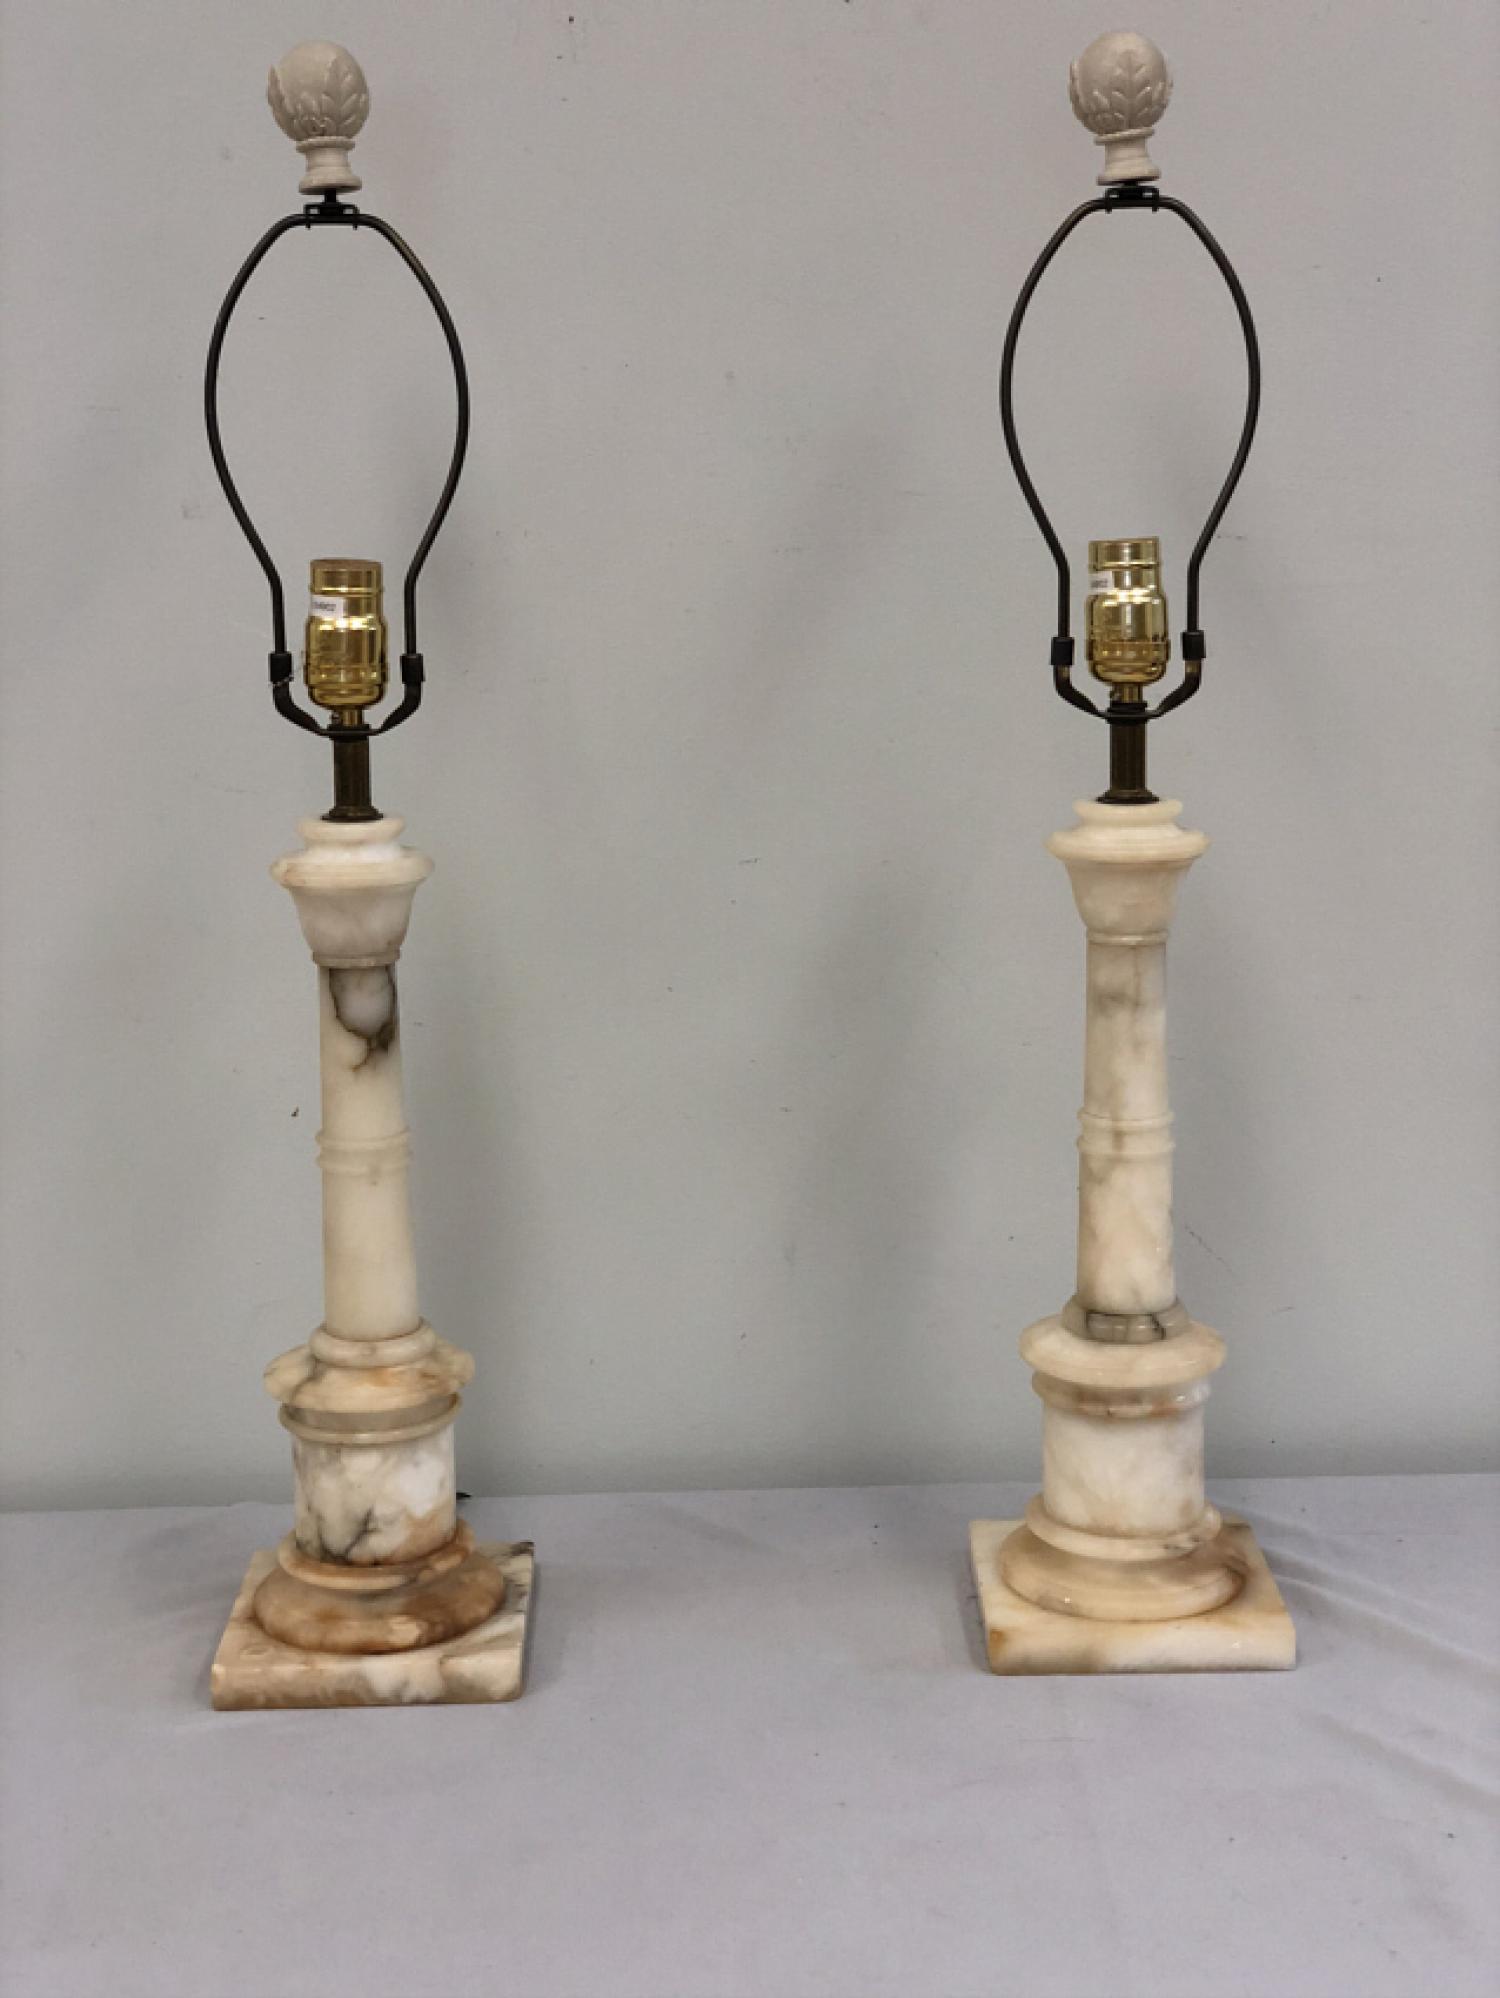 White marble column lamps c1920